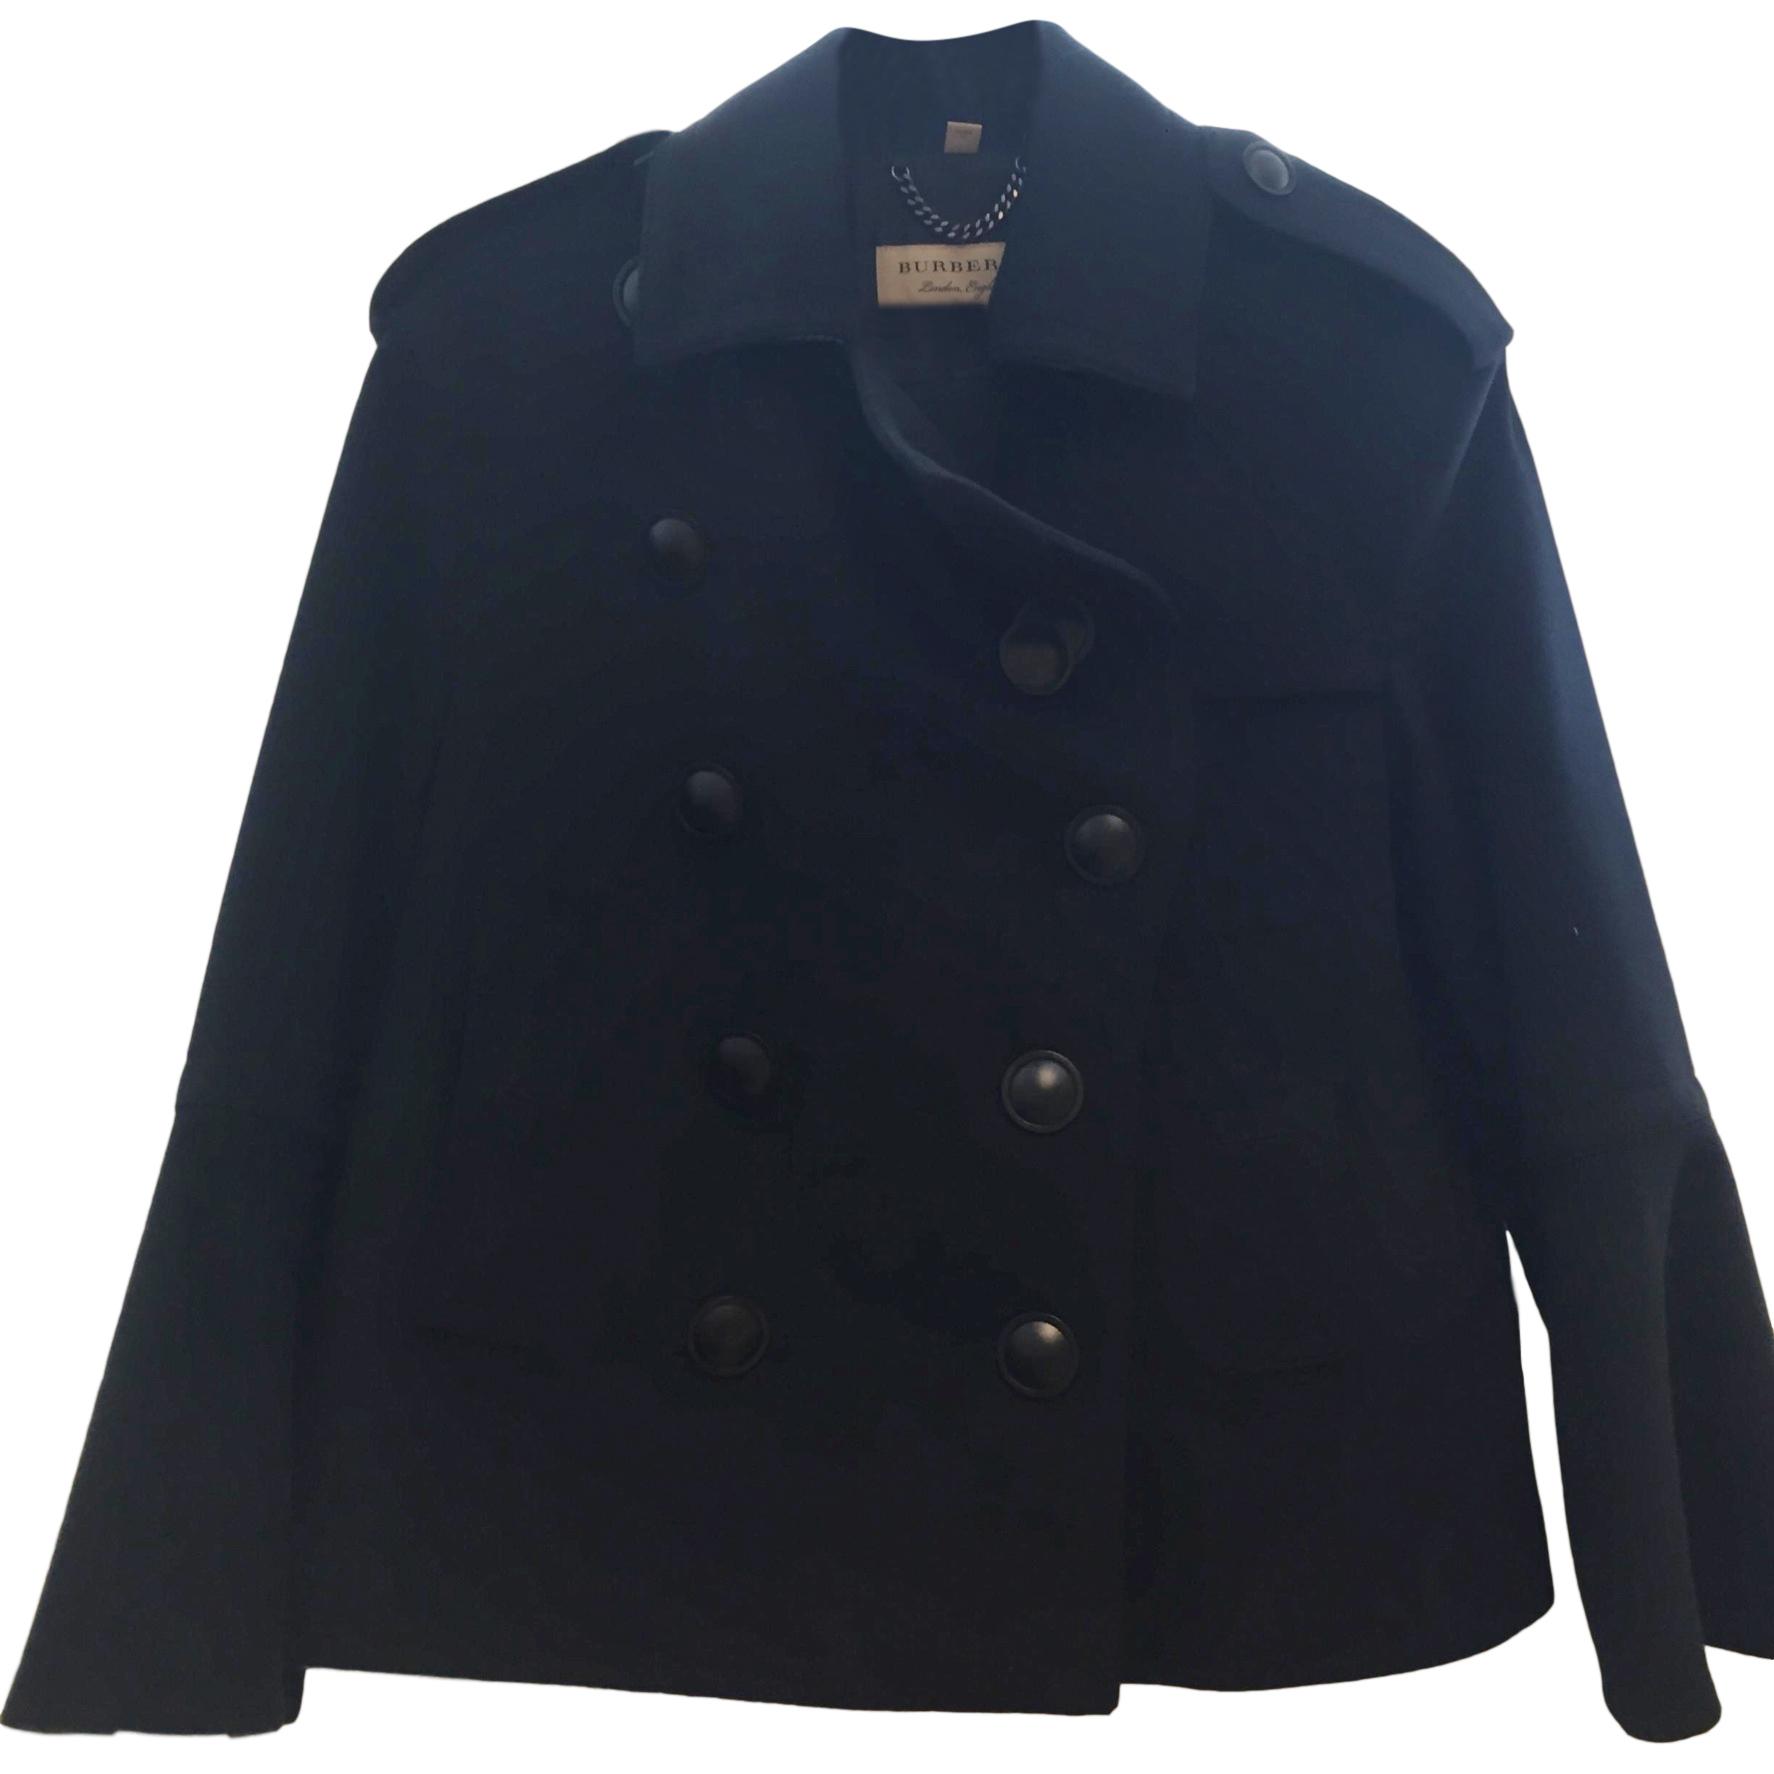 Burberry Black Wool Short Coat